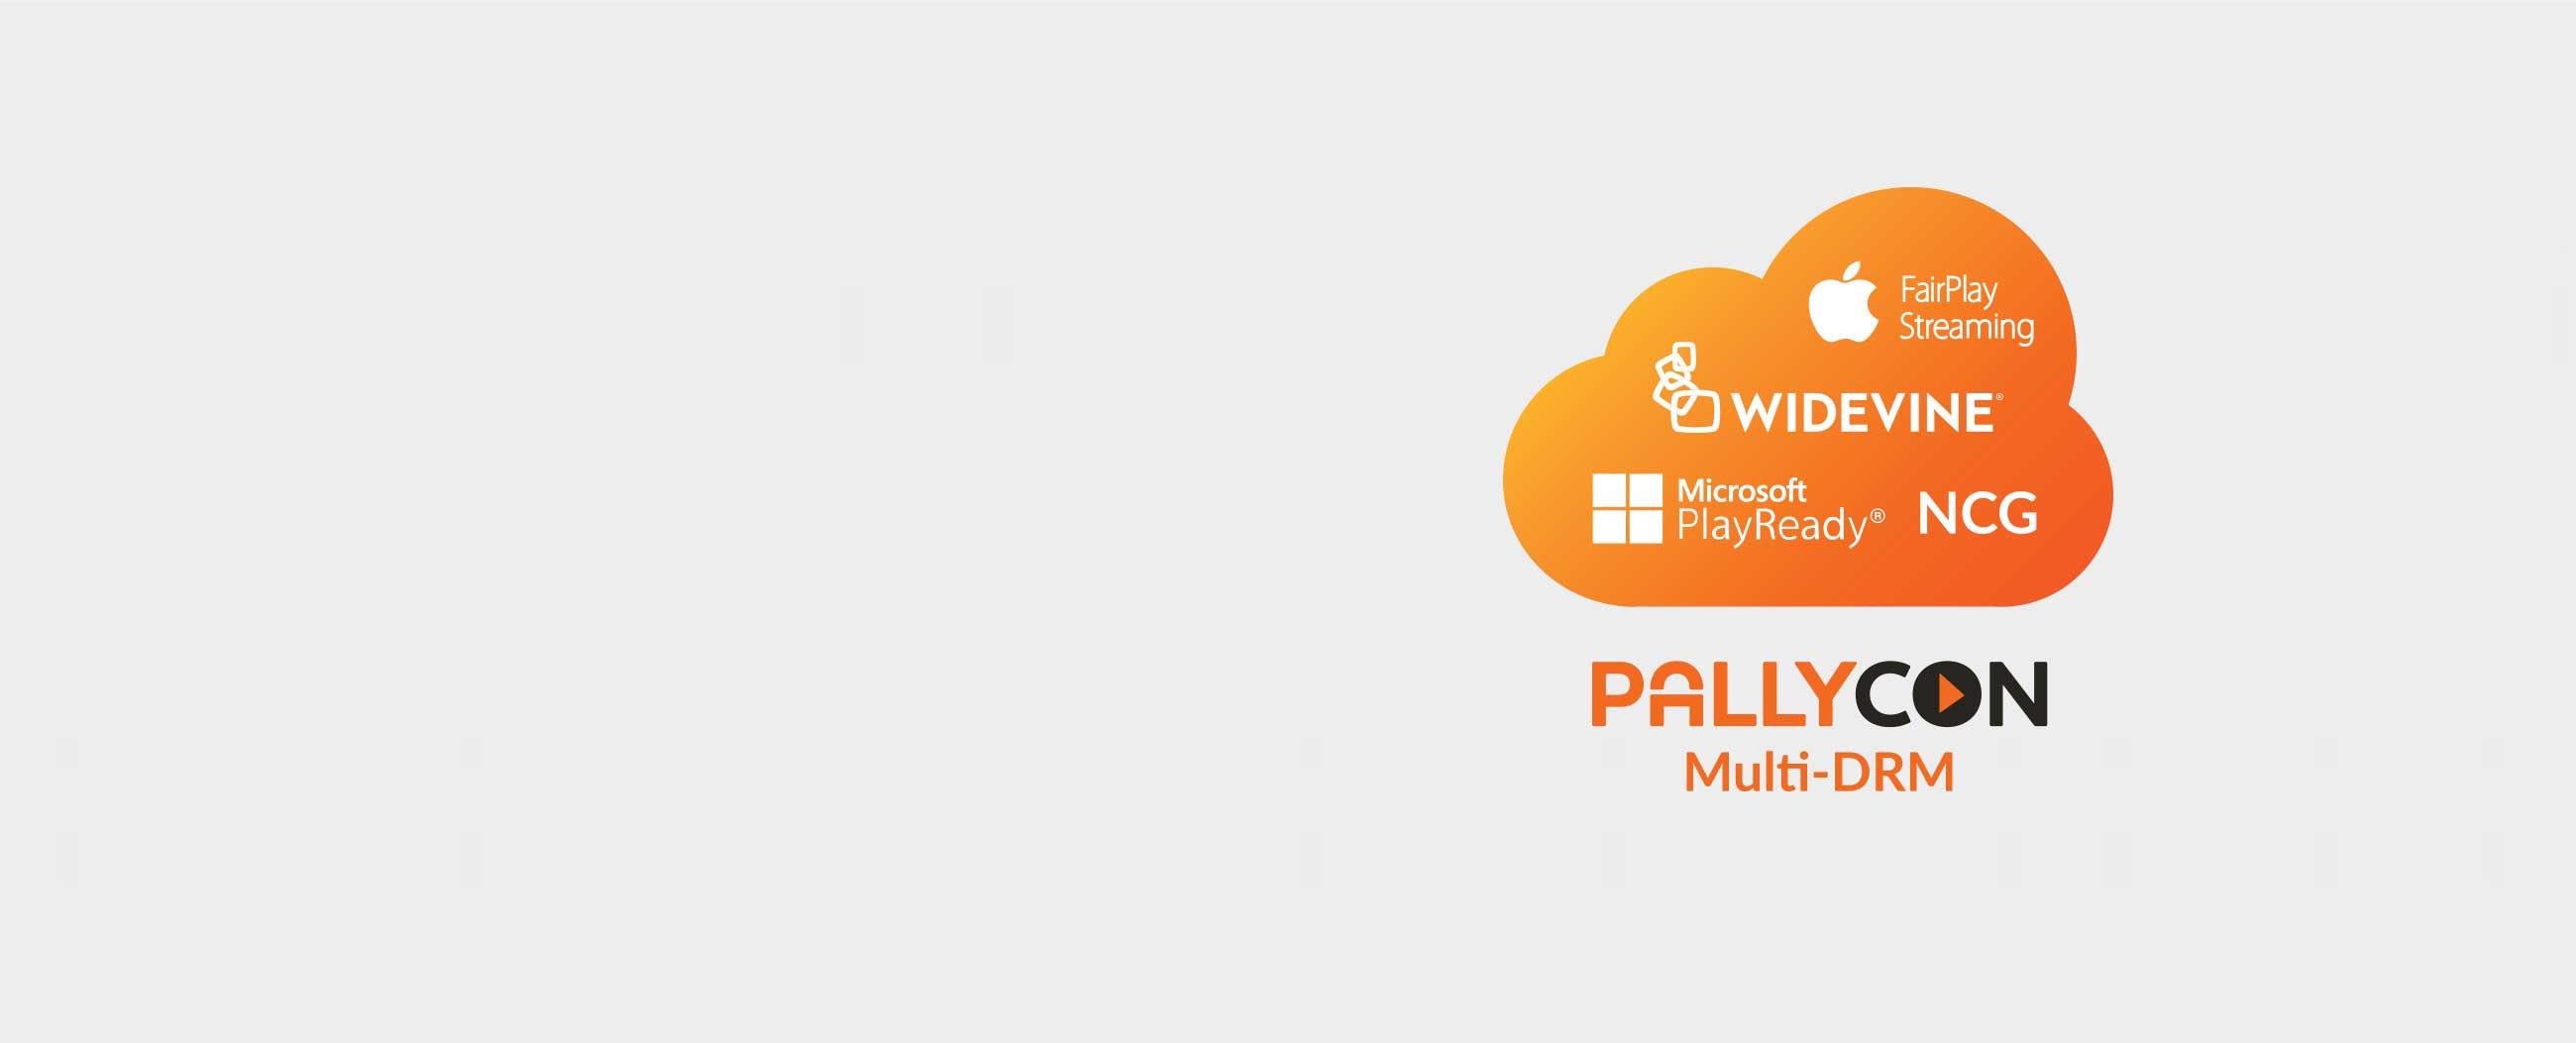 PallyCon Multi-DRM Service